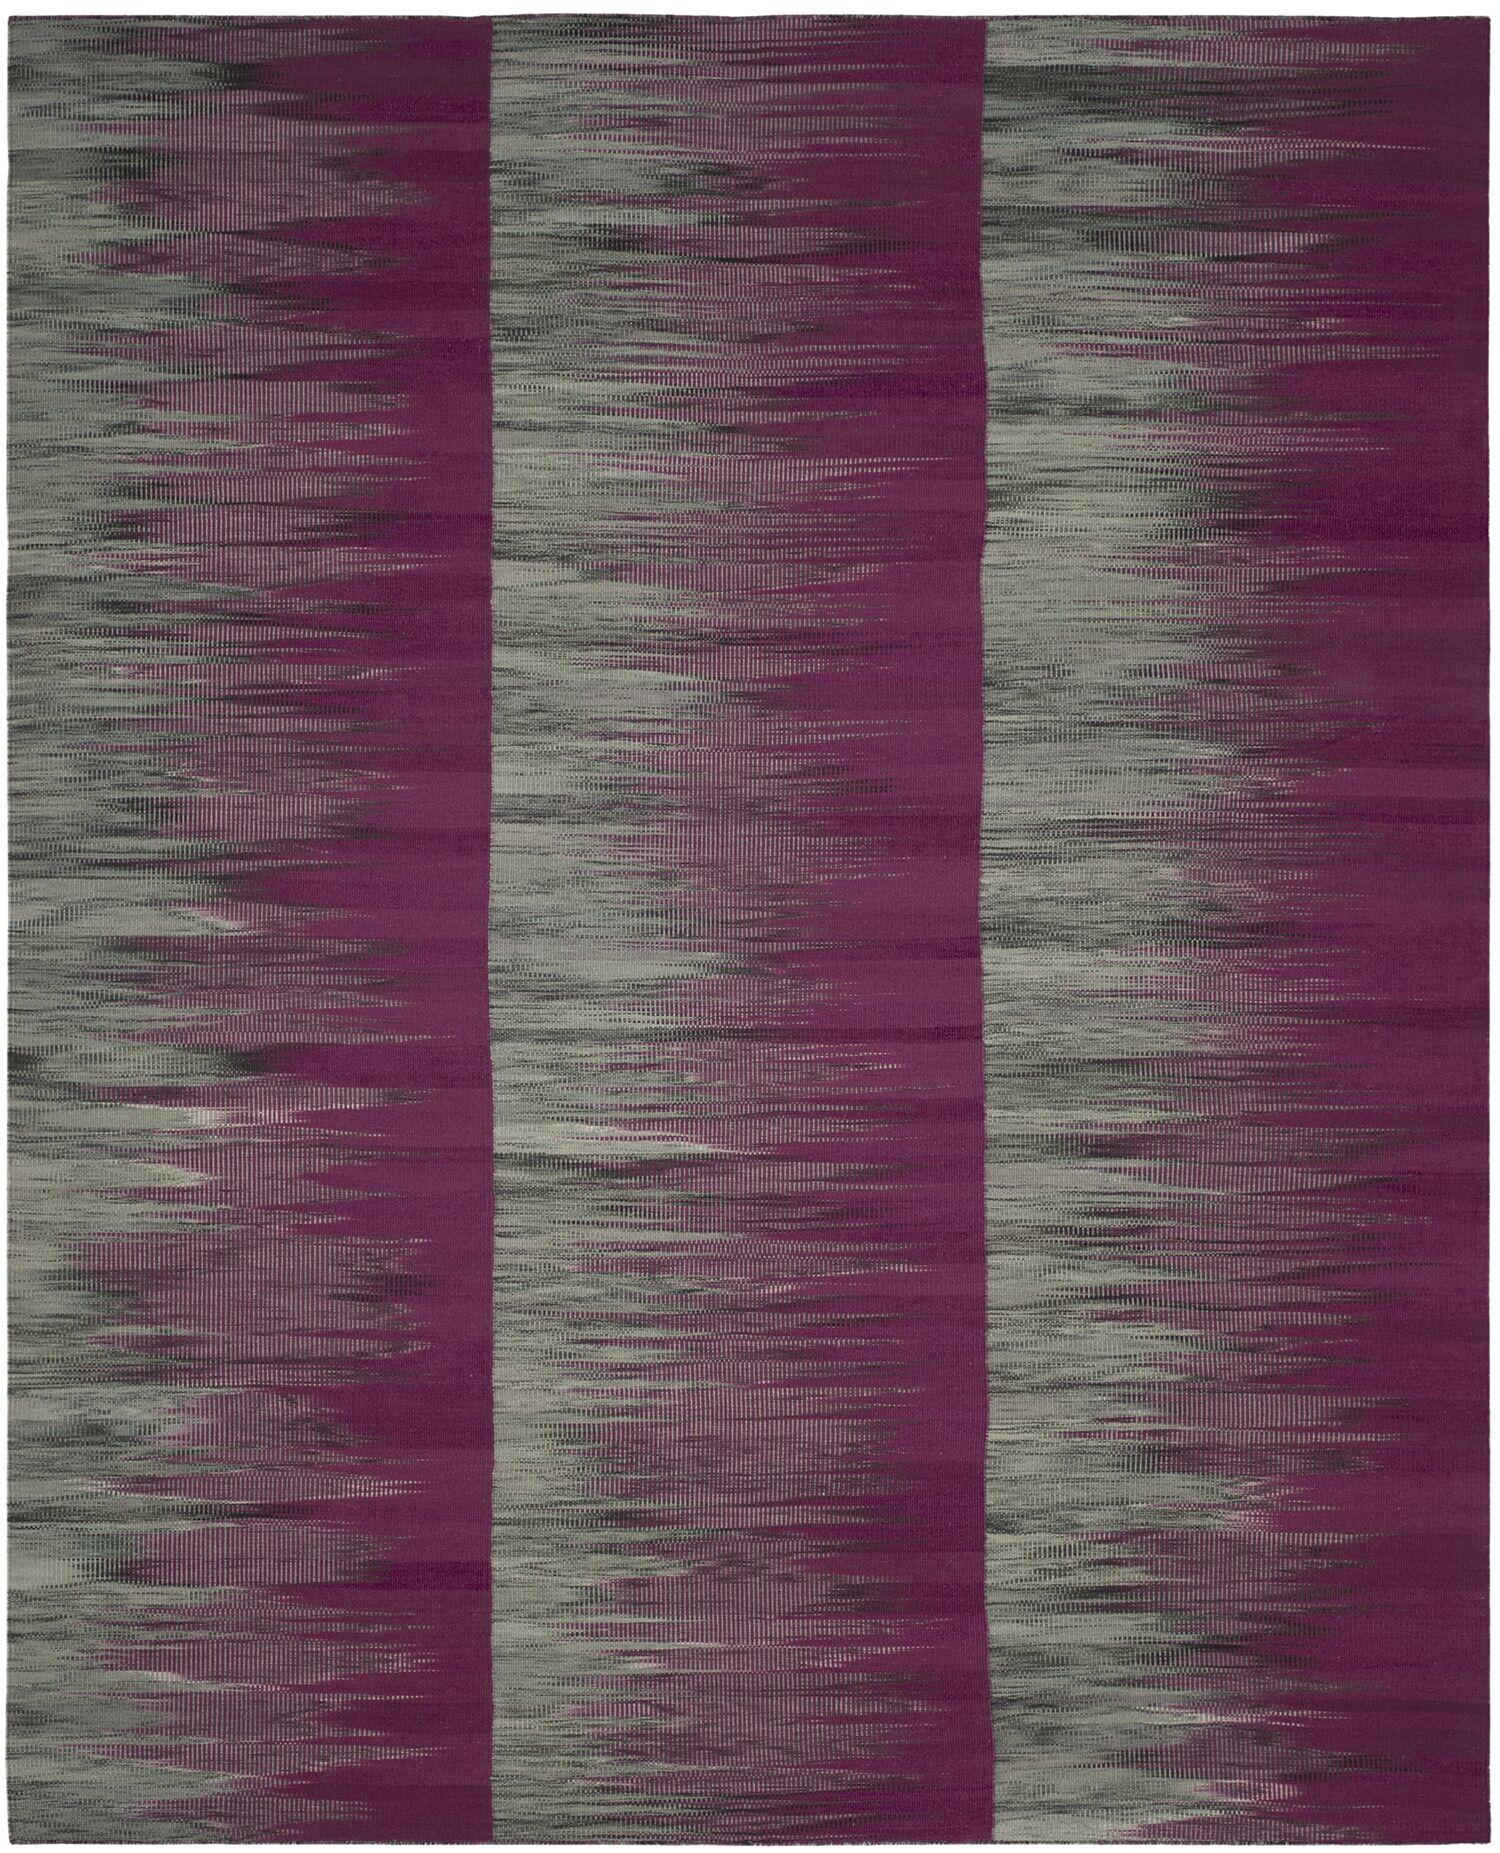 Amerina Hand-Woven Purple/Charcoal Area Rug Rug Size: Rectangle 8' x 10'